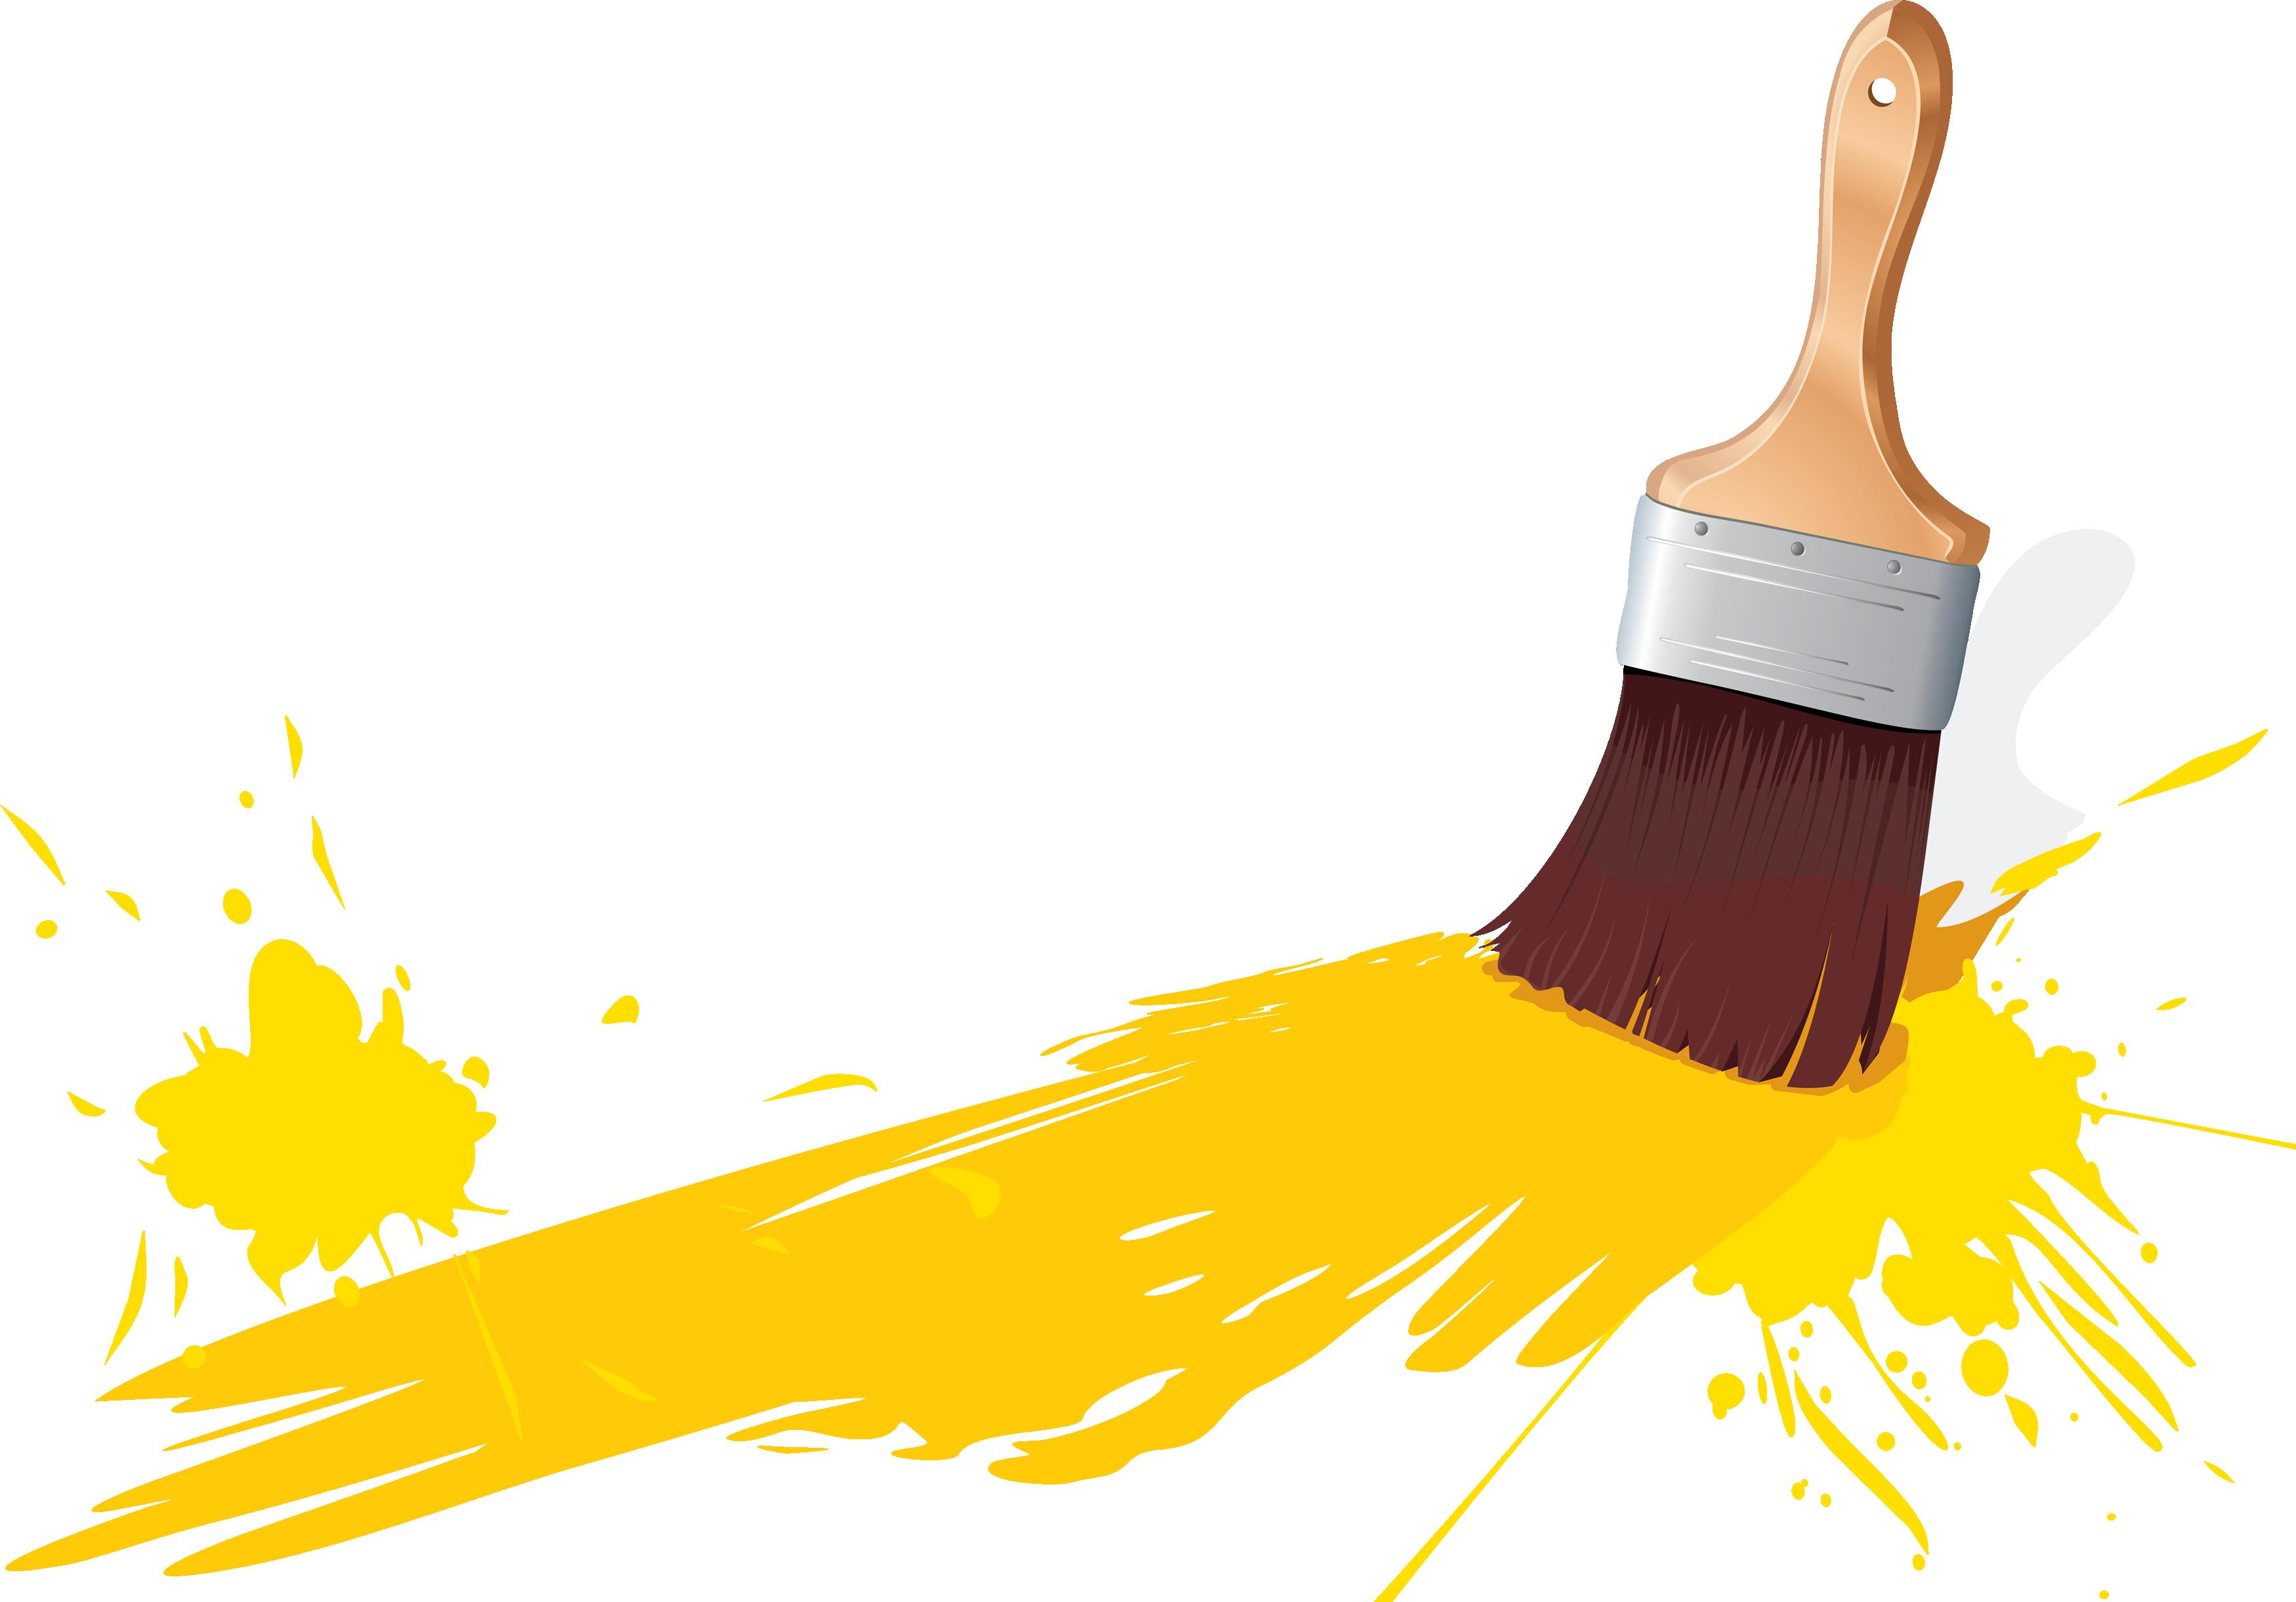 Paintbrush Png Image #20009 - Paint Brush, Transparent background PNG HD thumbnail